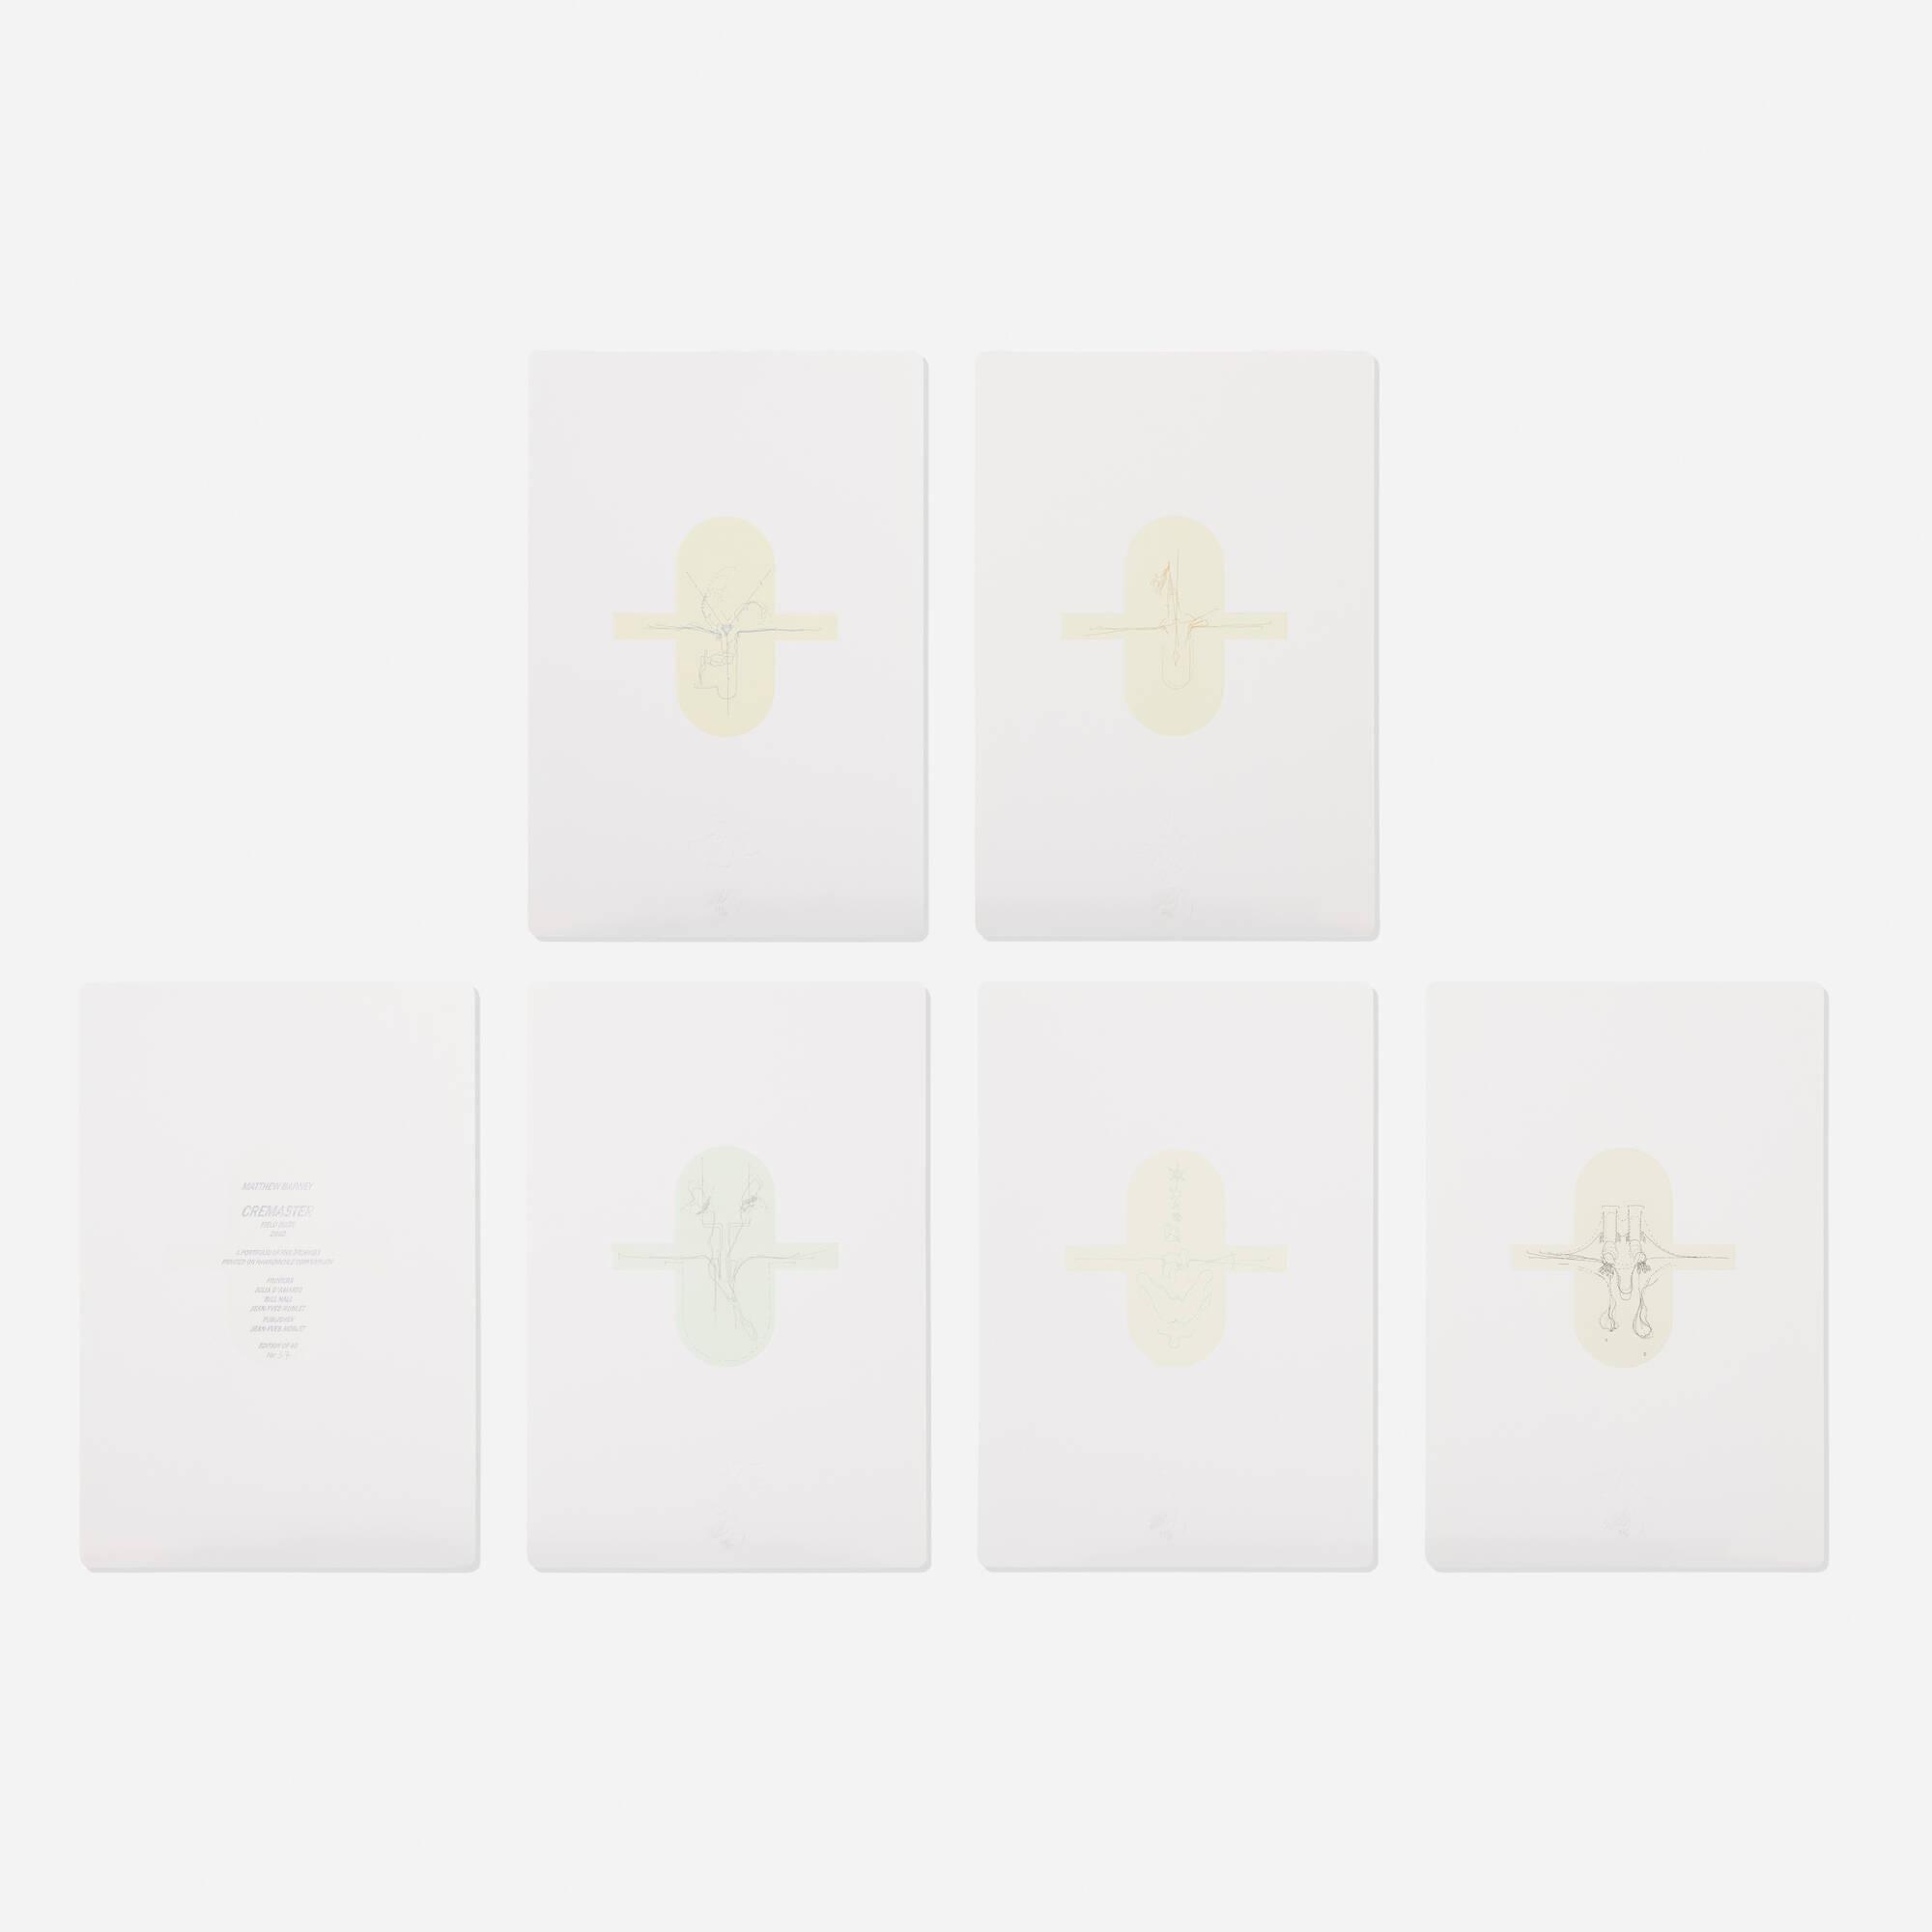 150: Matthew Barney / Cremaster: Field Suite (portfolio of five works) (1 of 3)